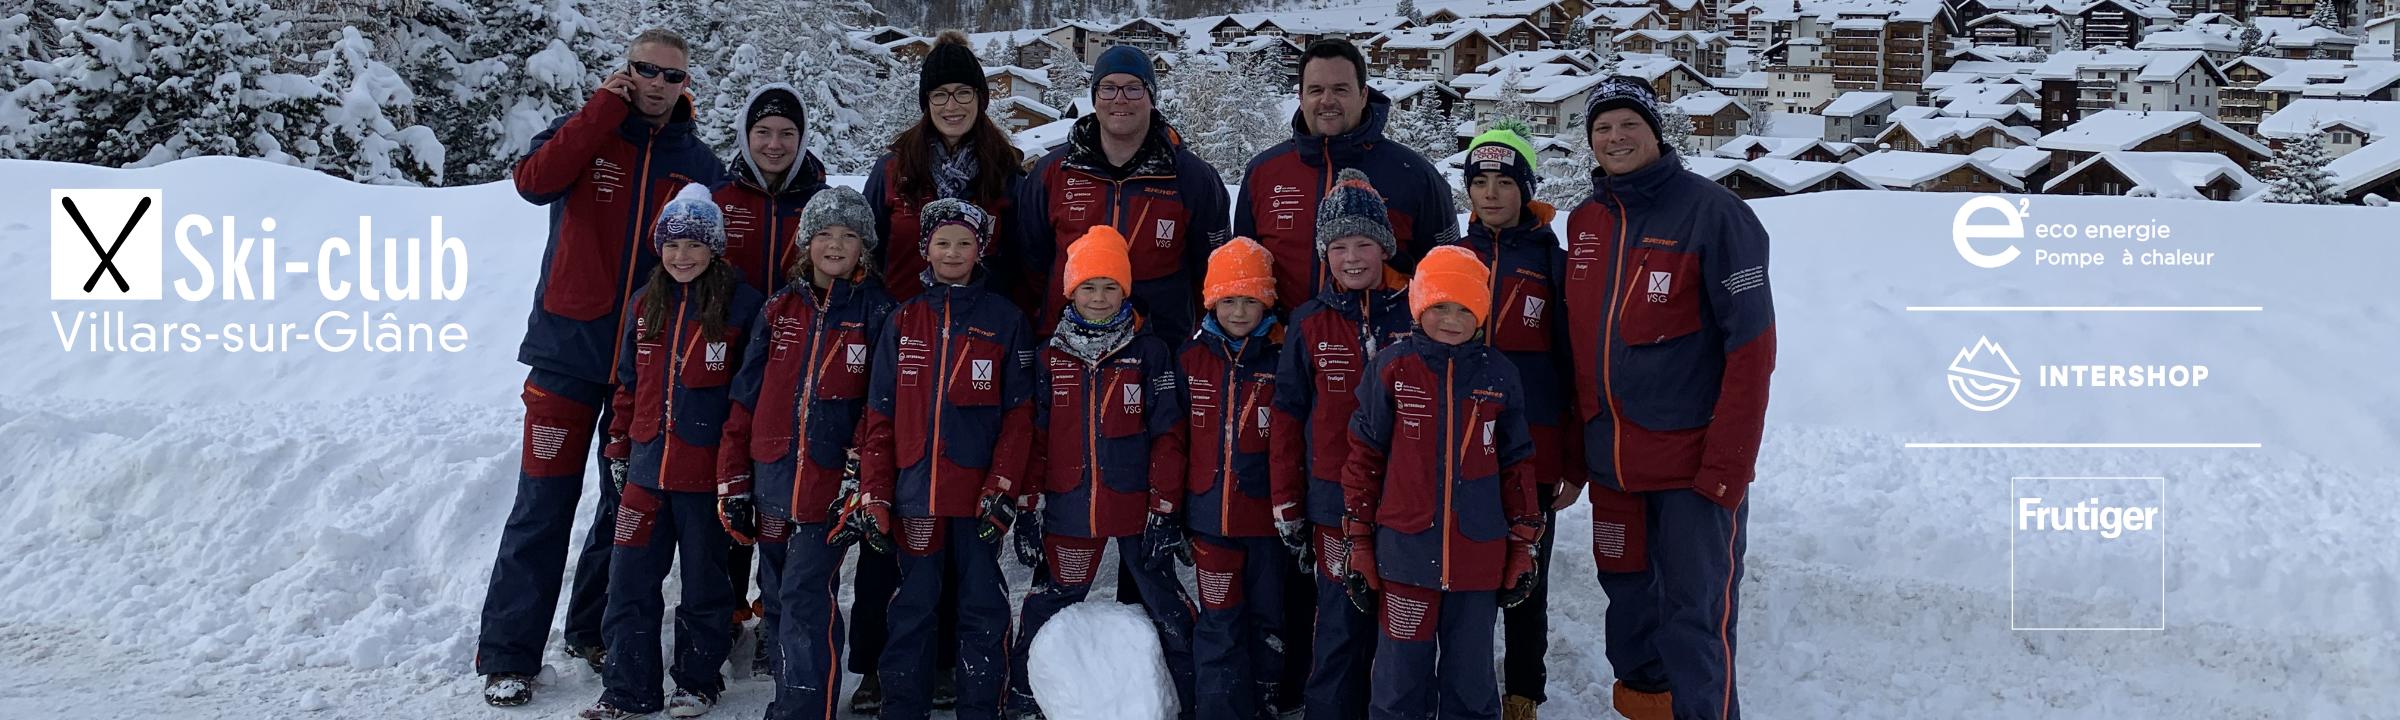 Ski-Club Villars-sur-Glâne